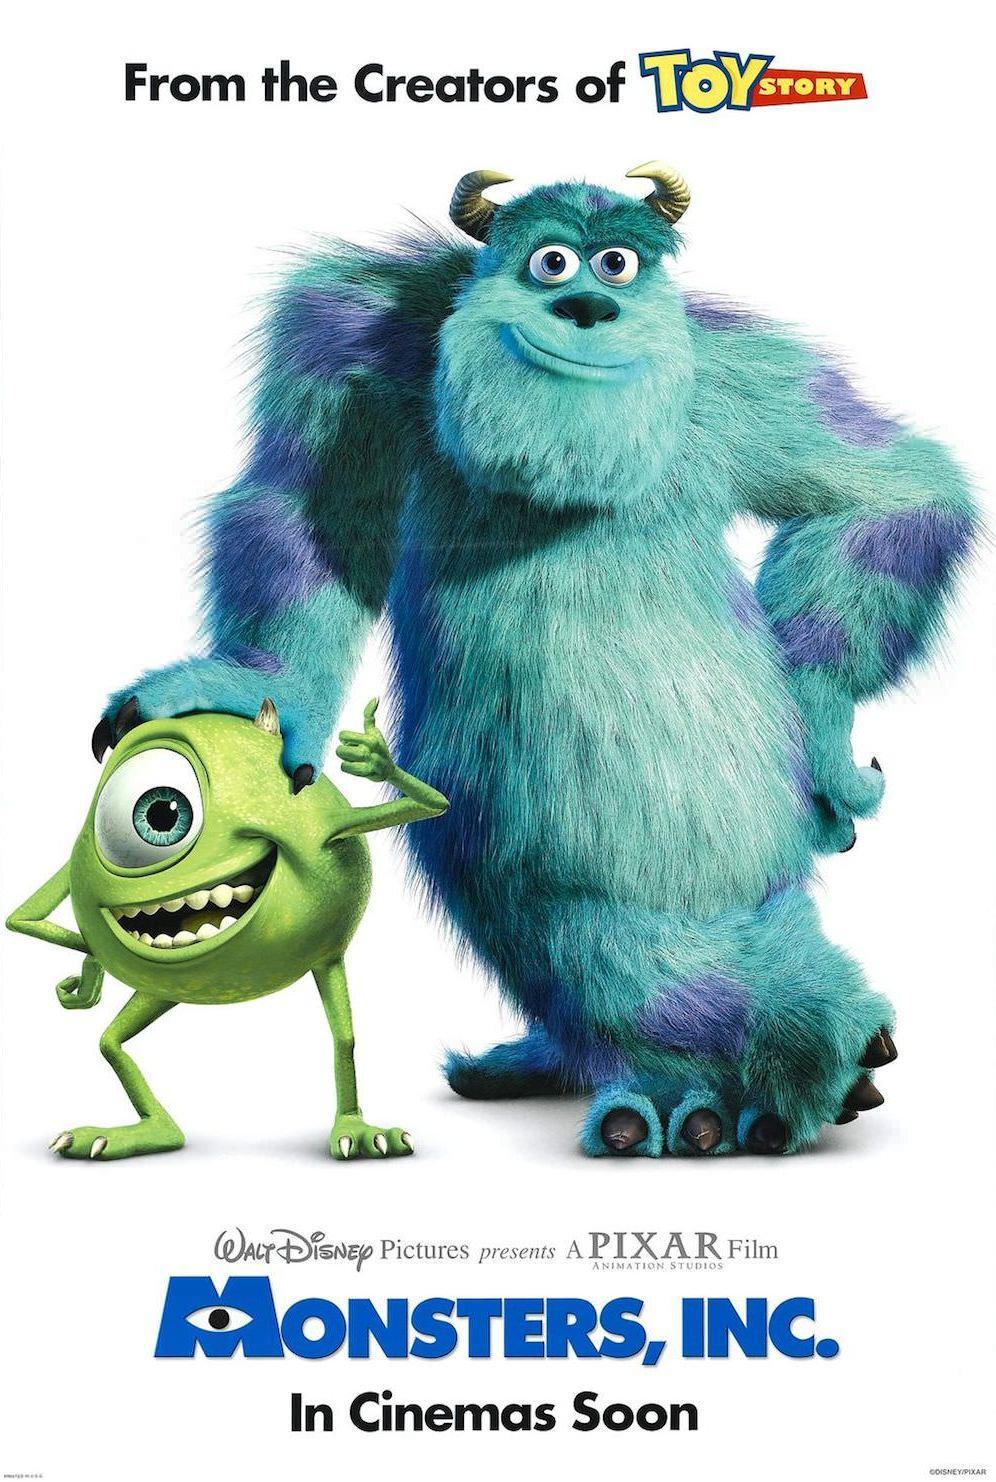 Monstres et cie docter pixar